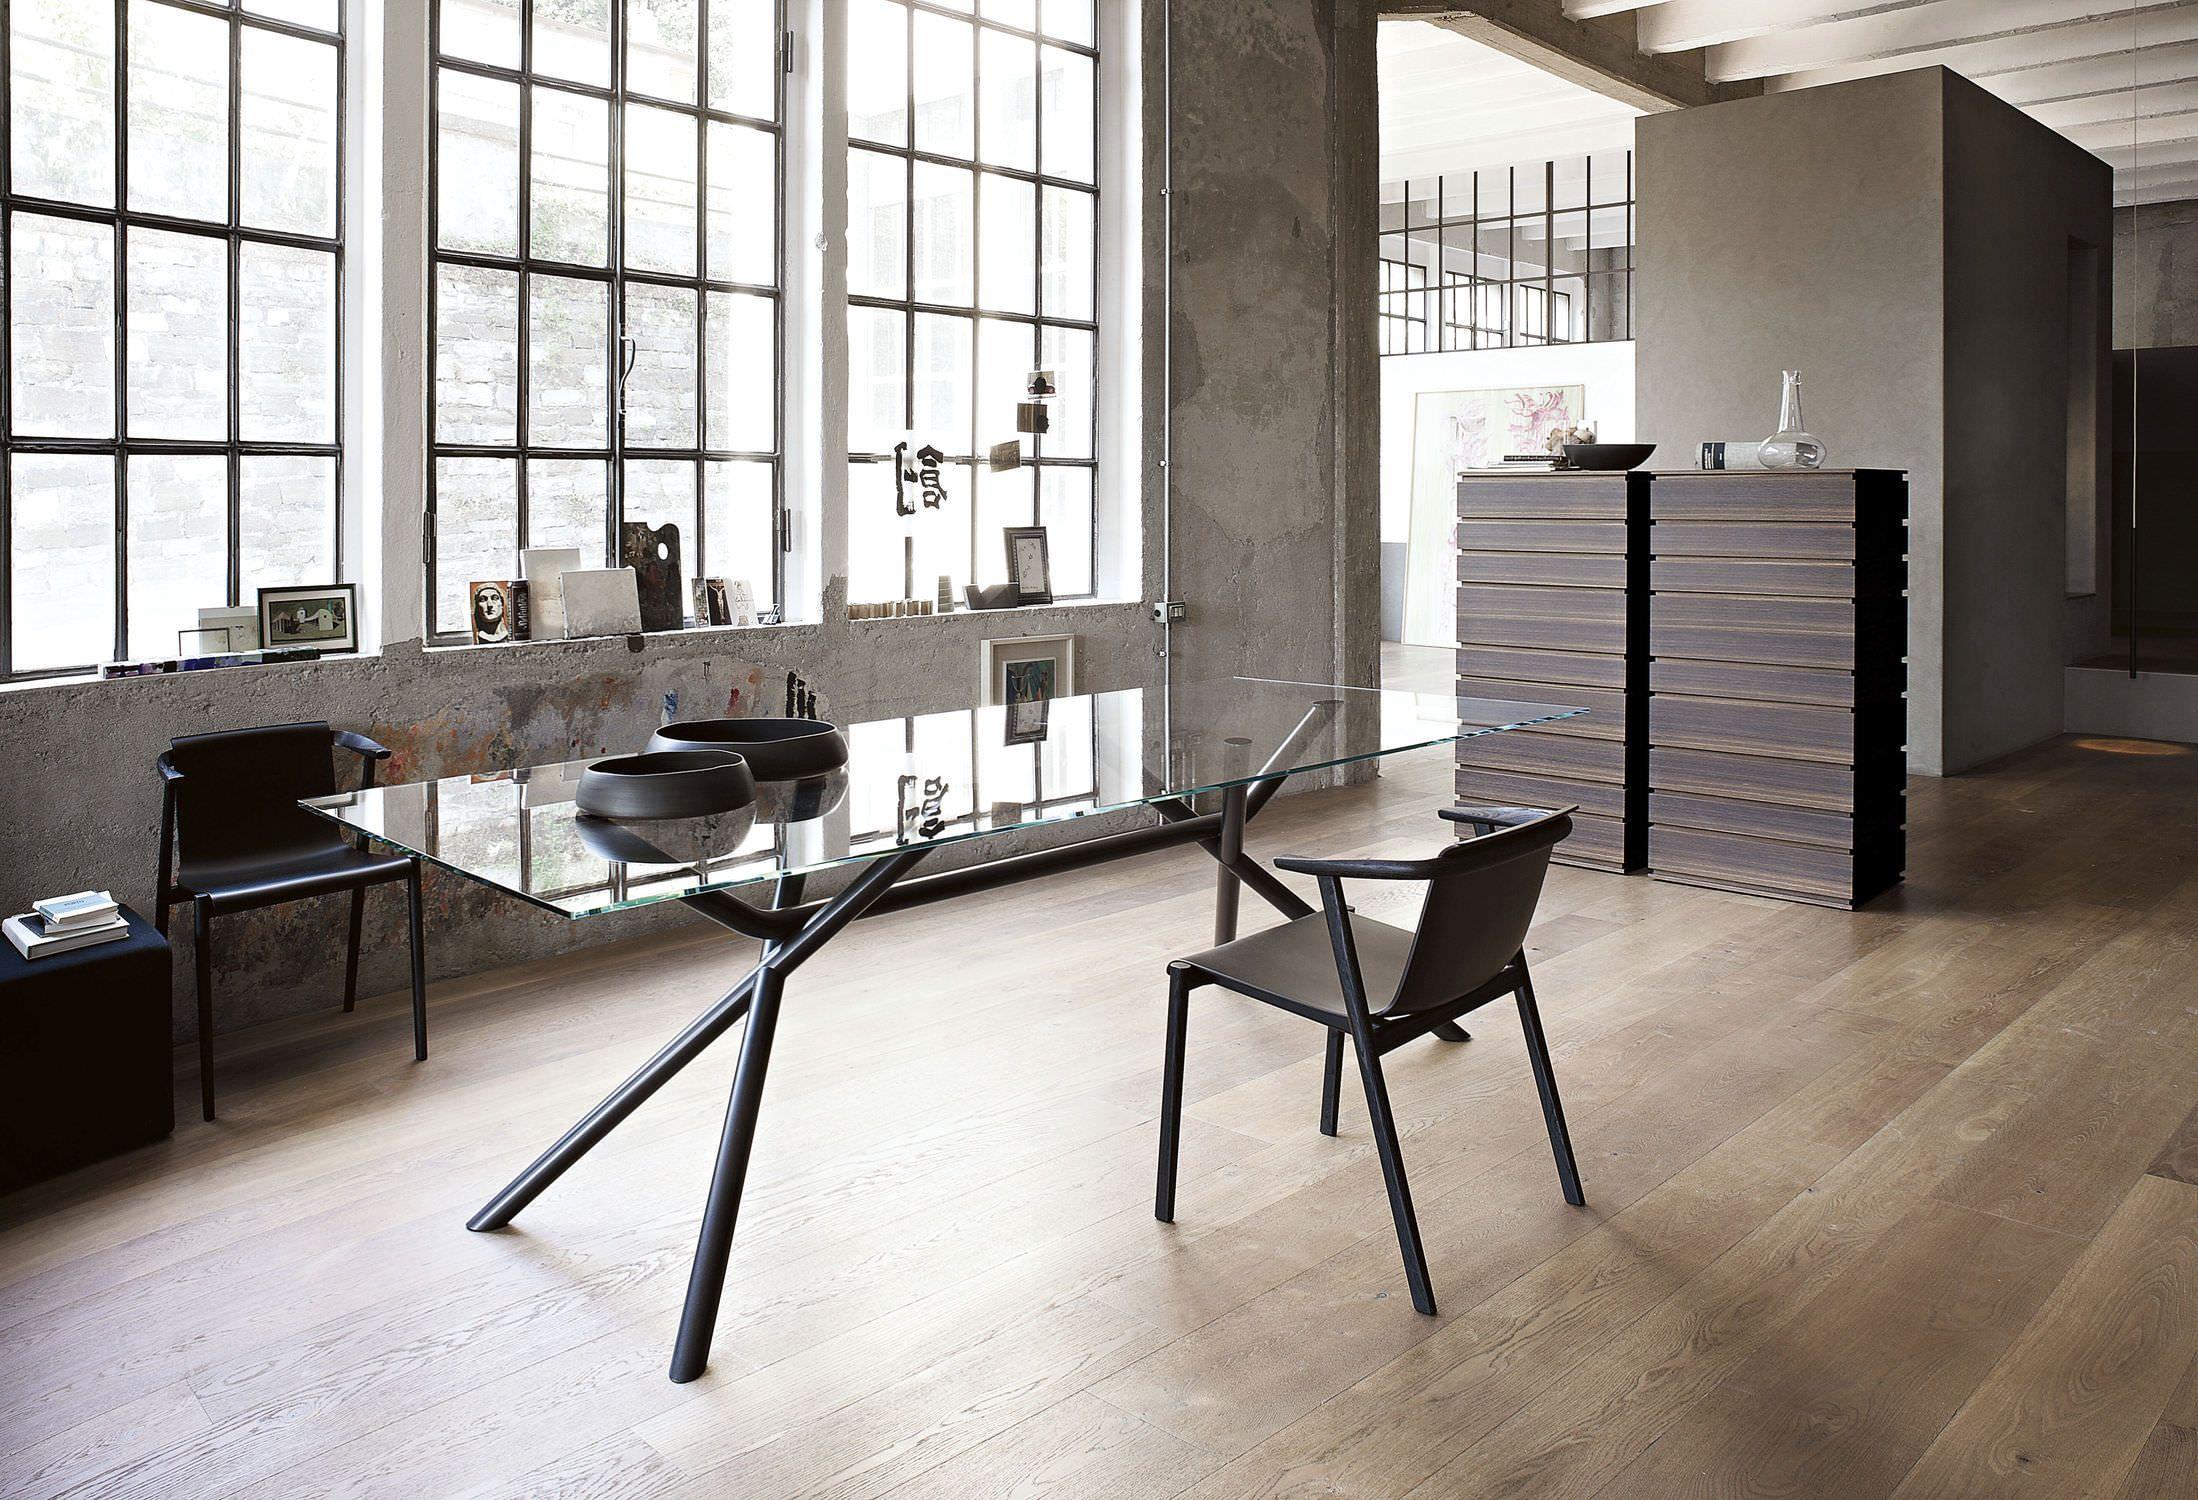 Wonderful Black Stainless Glass Cool Design Interior Dining Table Gallery  Of Set Top Room Rectangular Chairs. Online Interior Design. Best Interior  Design ...